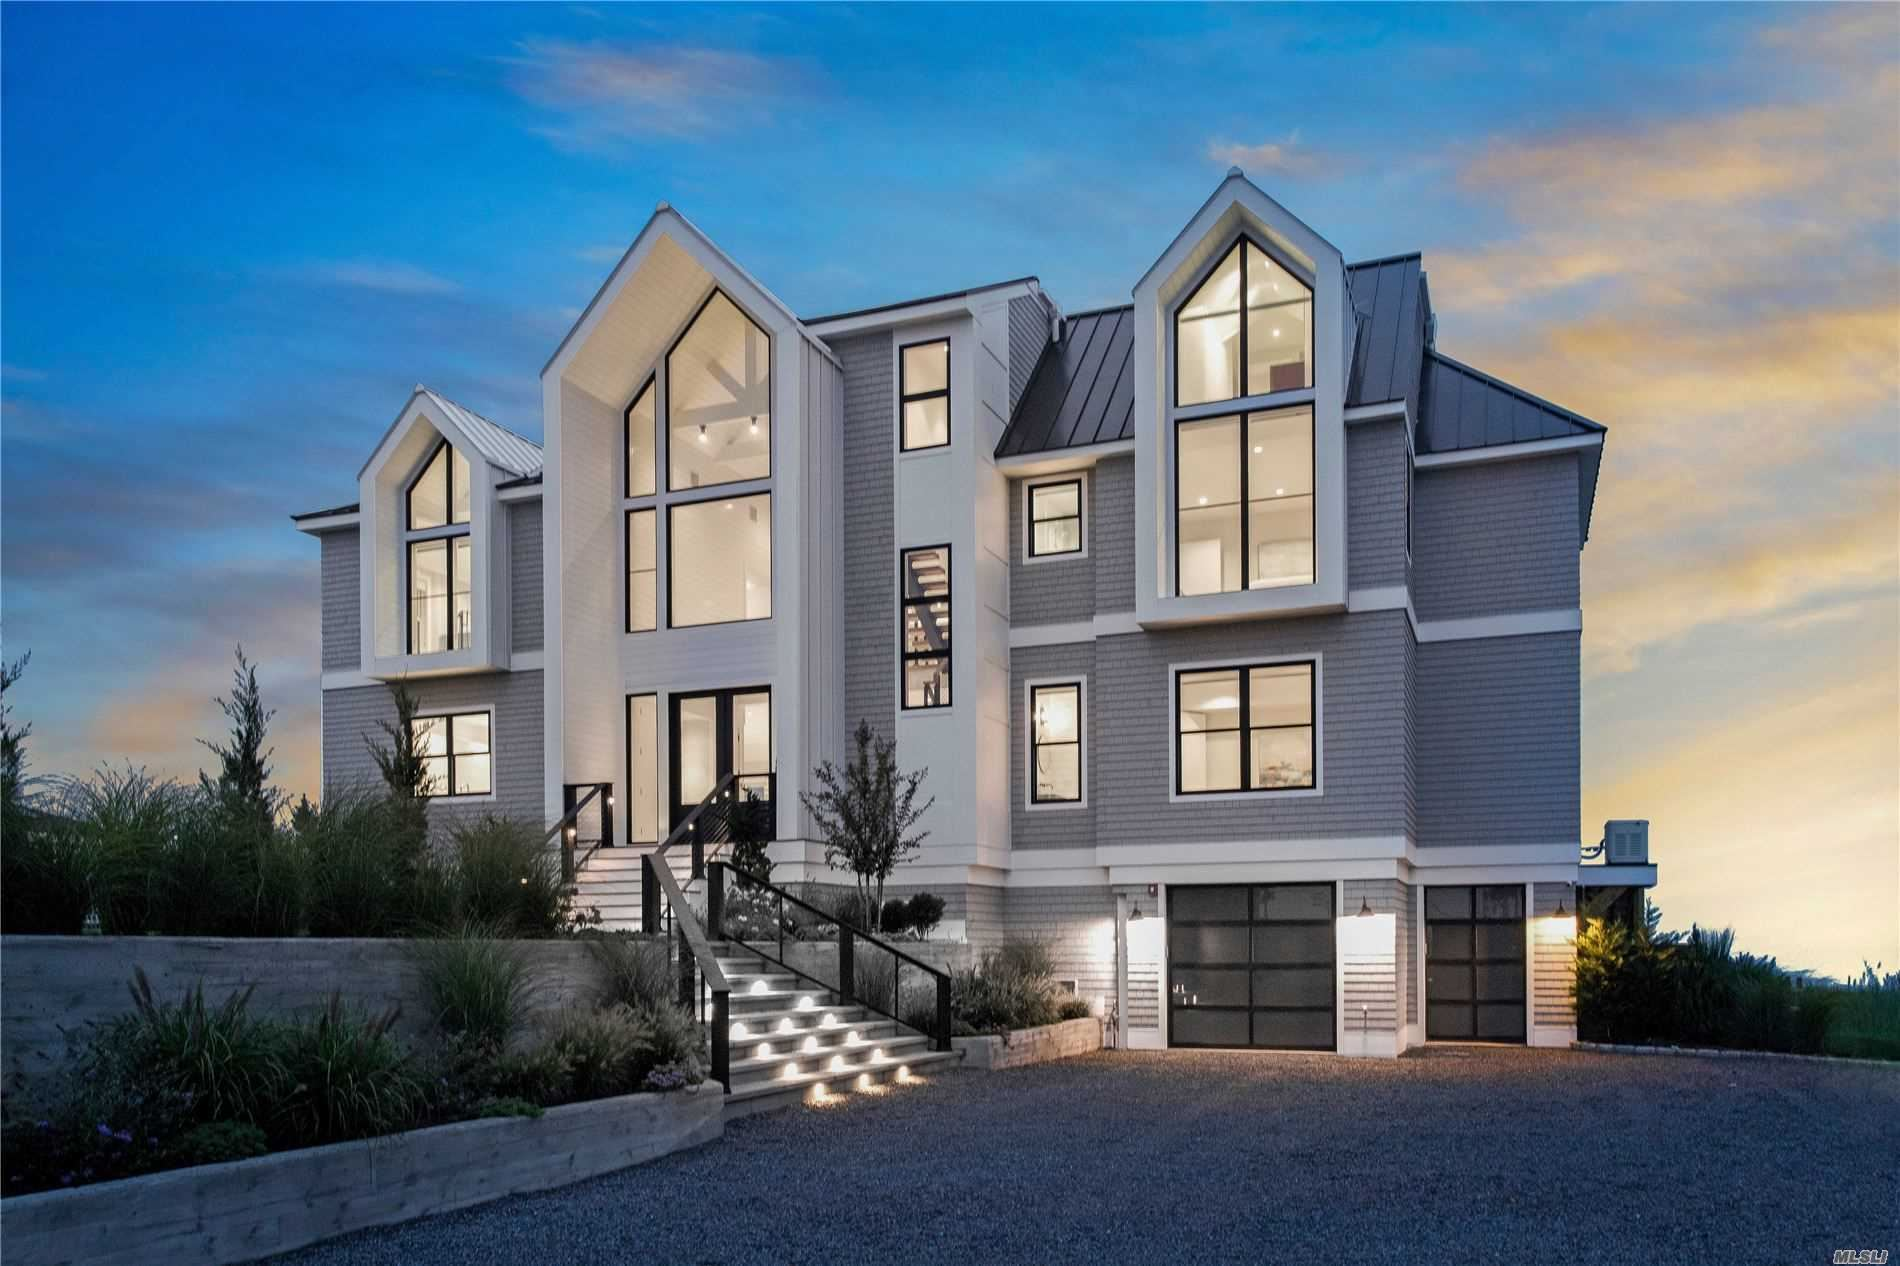 20 Cove Lane, Westhampton Beach, NY 11978 - MLS#: 3191224